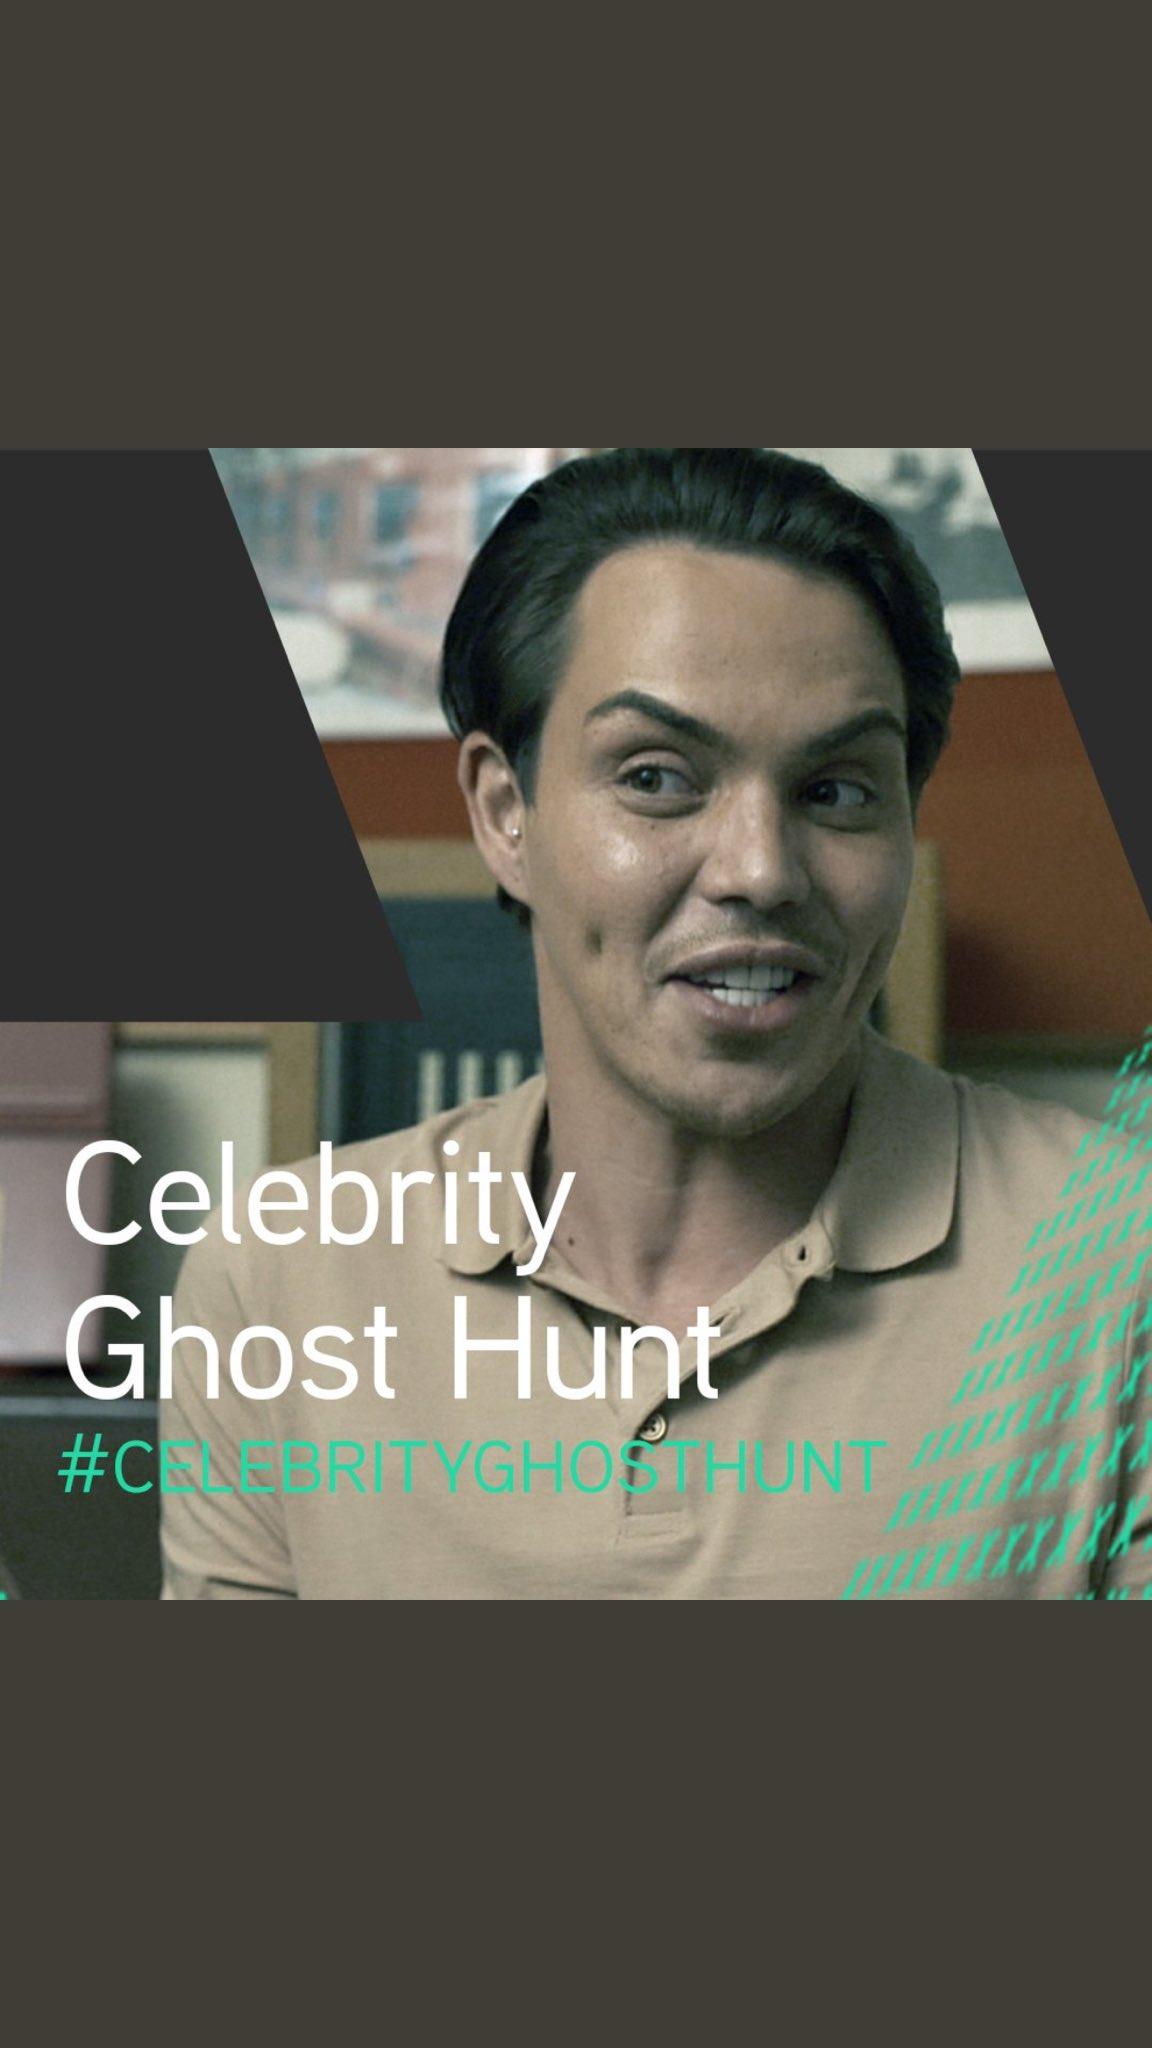 Tune into @5star_tv NOW for #CelebrityGhostHunt 👻👻👻 https://t.co/9PhZ21jpRx